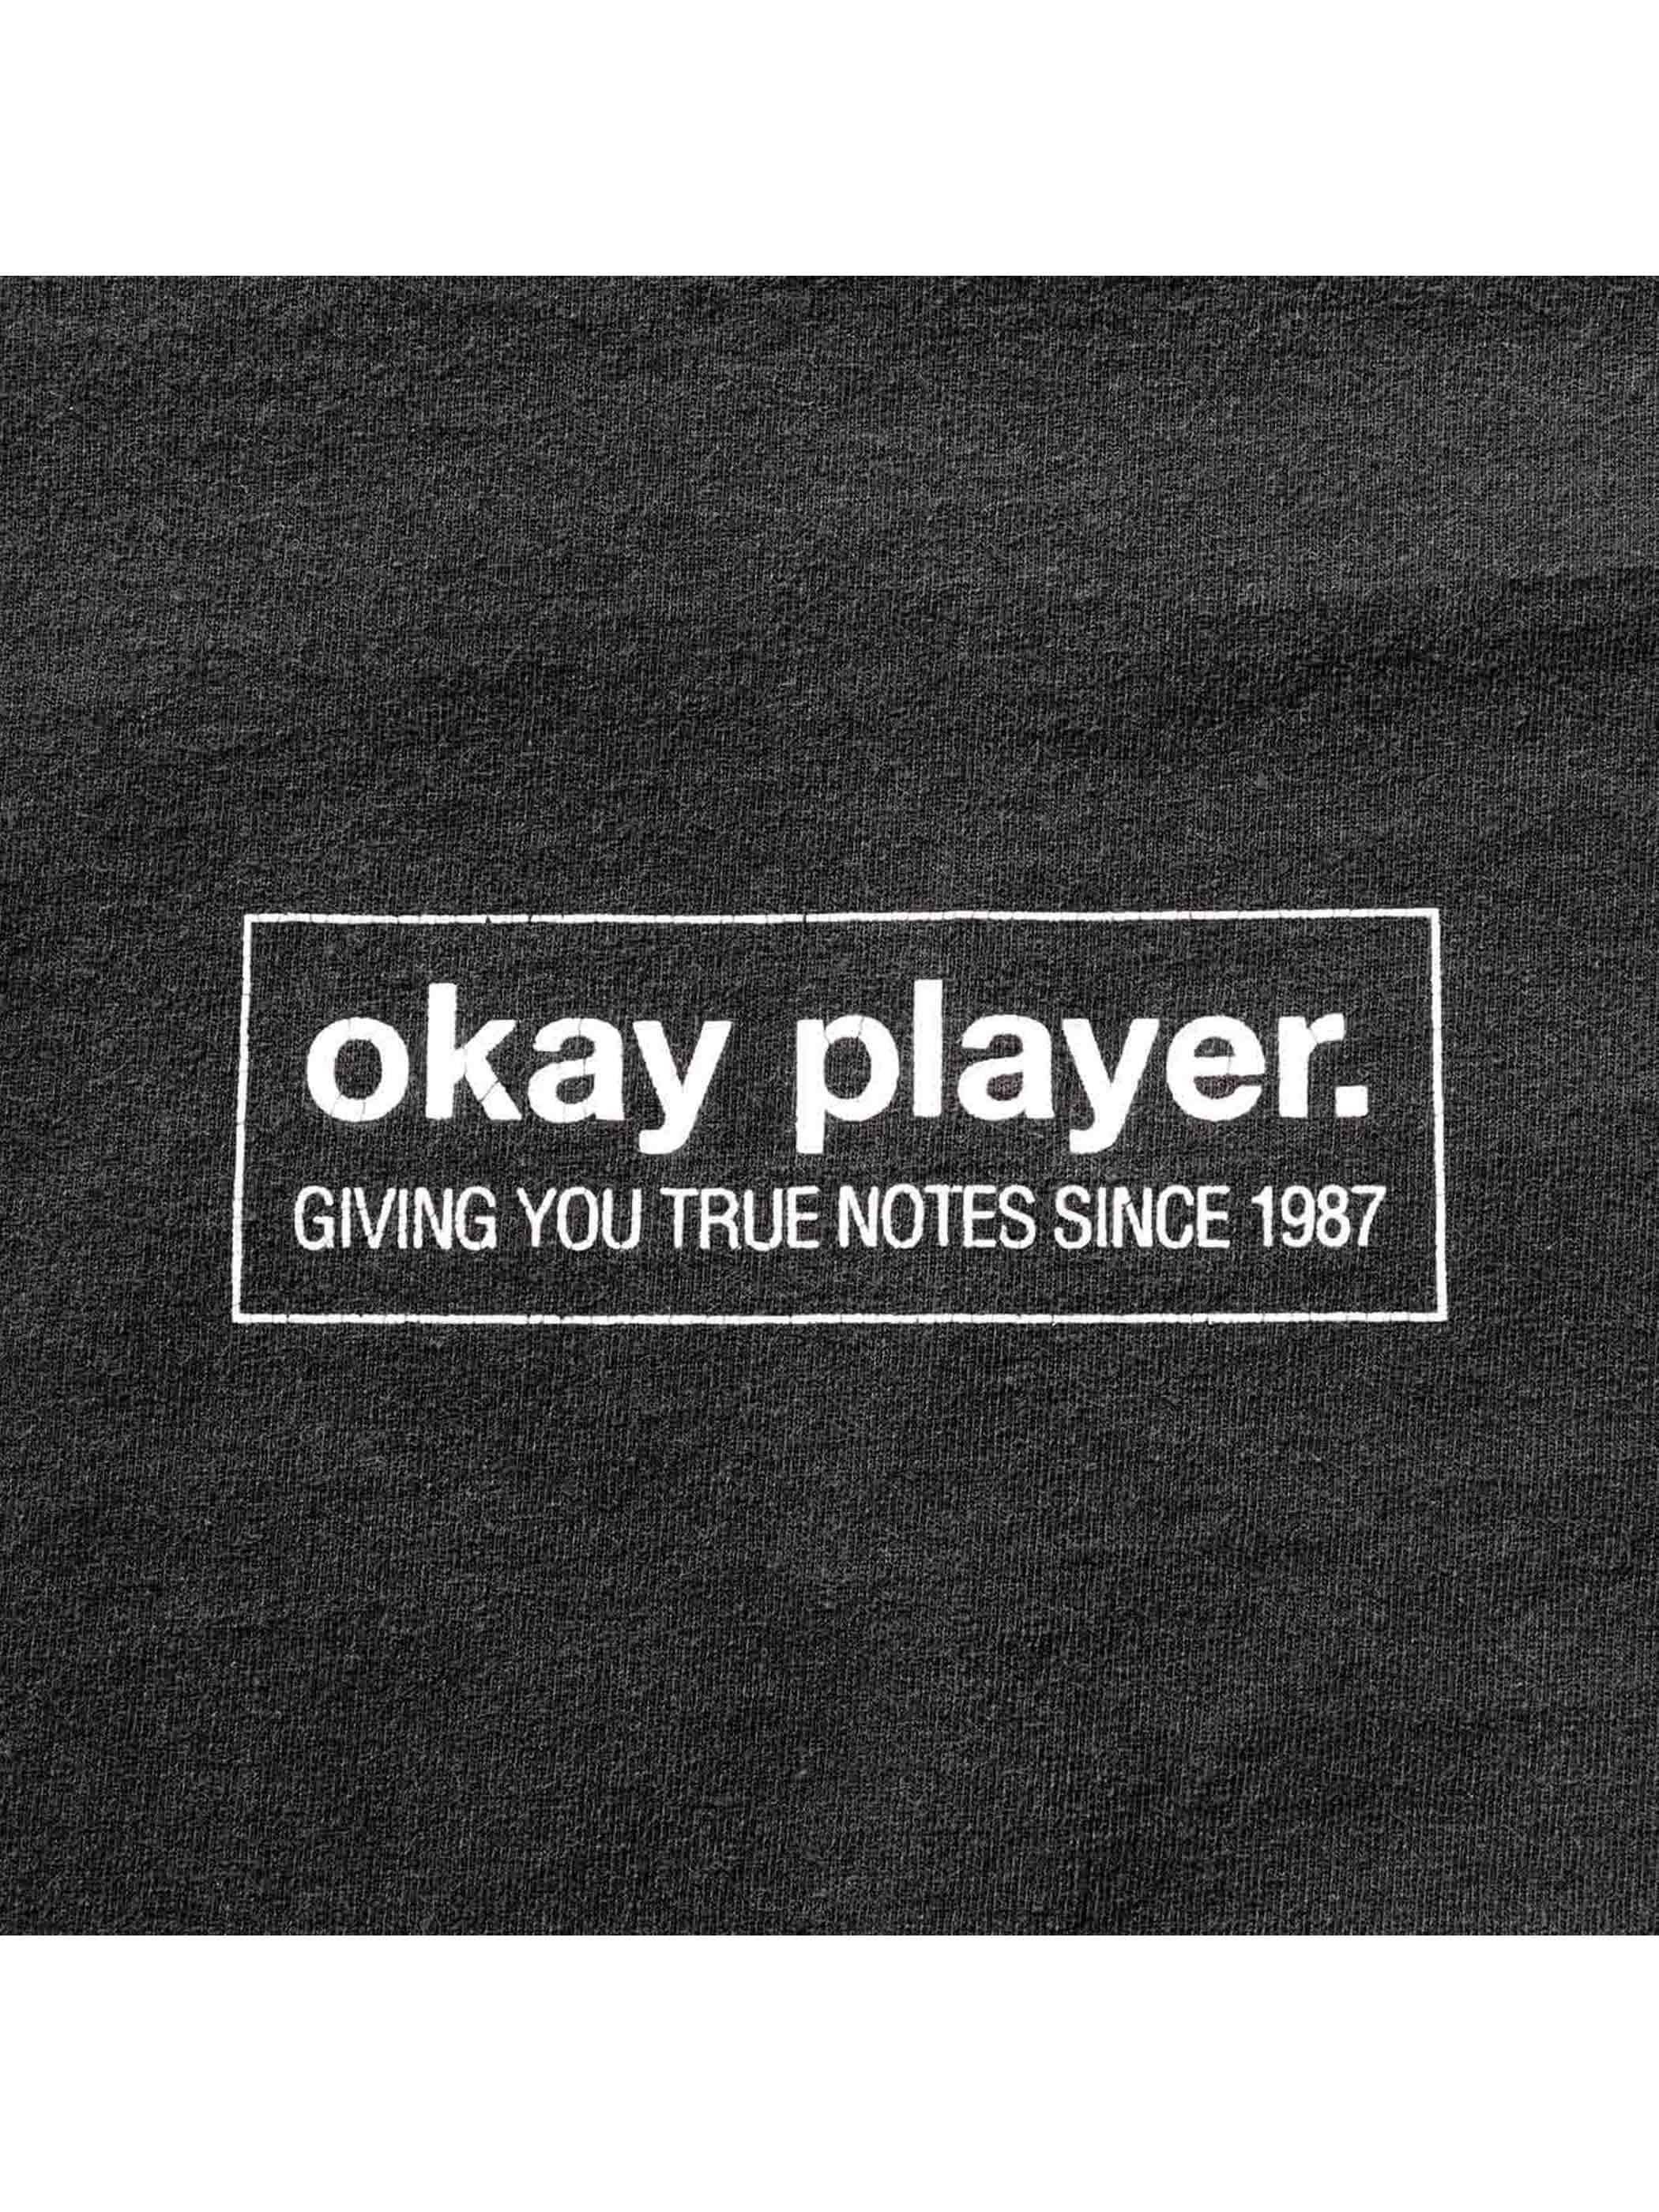 "90's RAHZEL / LEVI'S SILVER TAB ""MAKE THE MUSIC 2000"" OKAY PLAYERプロモTシャツ [XL]"